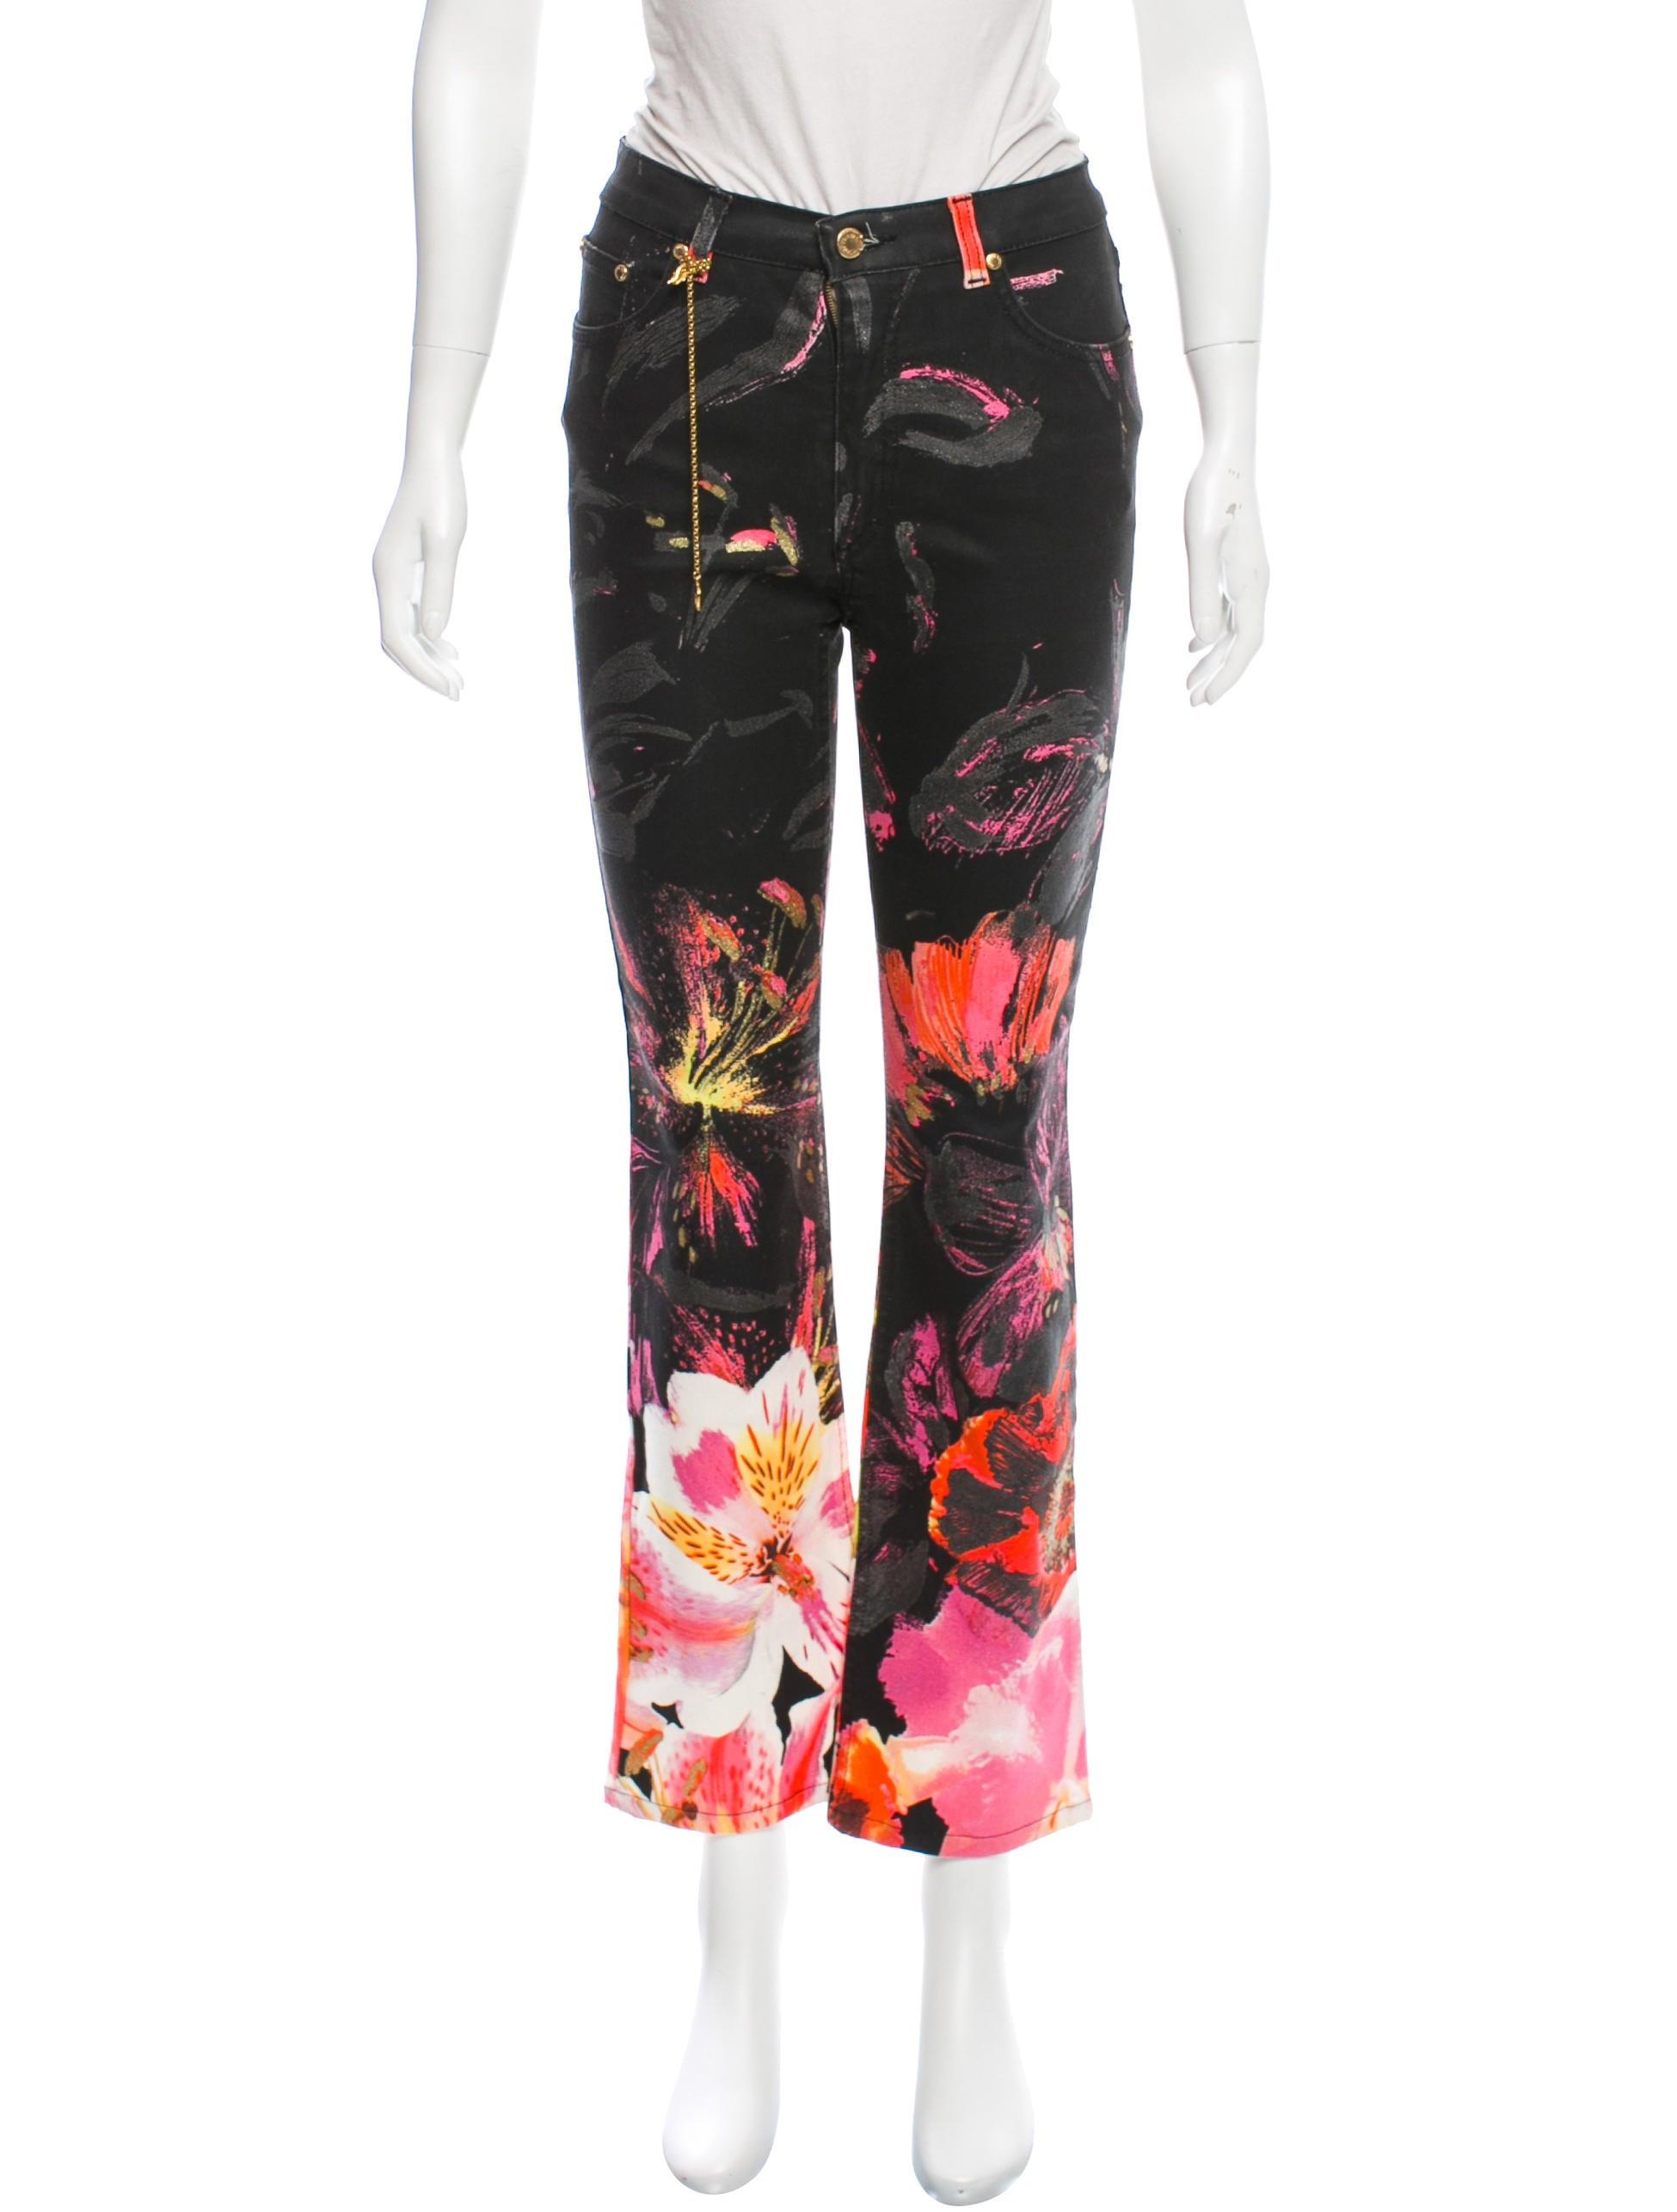 1f7c317f98f7d Roberto Cavalli Floral Print Mid-Rise Jeans - Clothing - ROB46975 ...